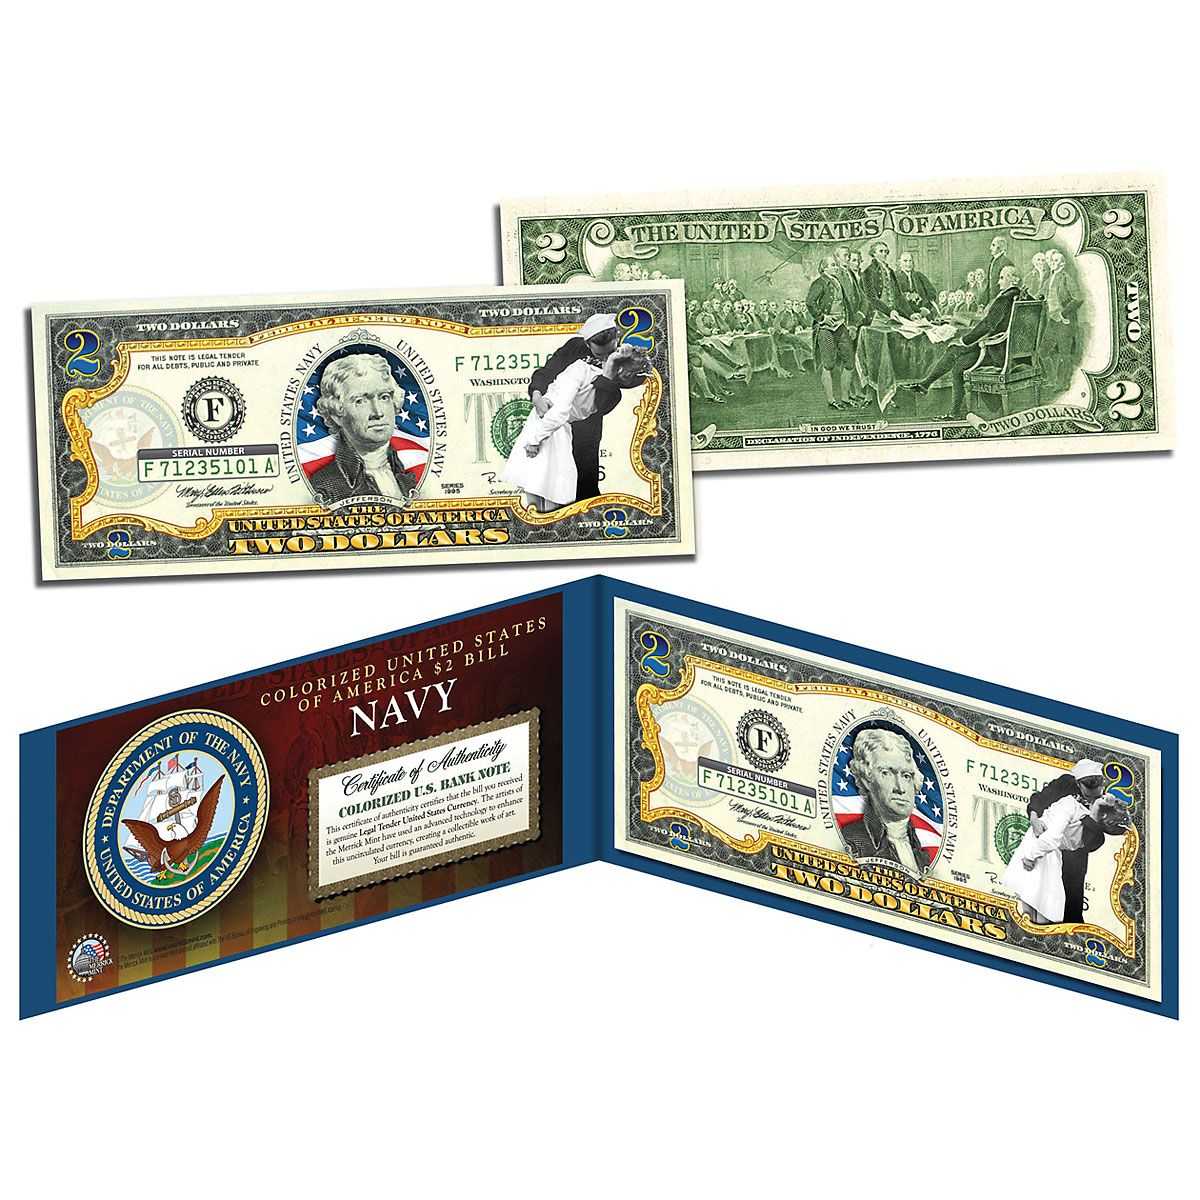 USA Navy WWII 2 Dollar Bill